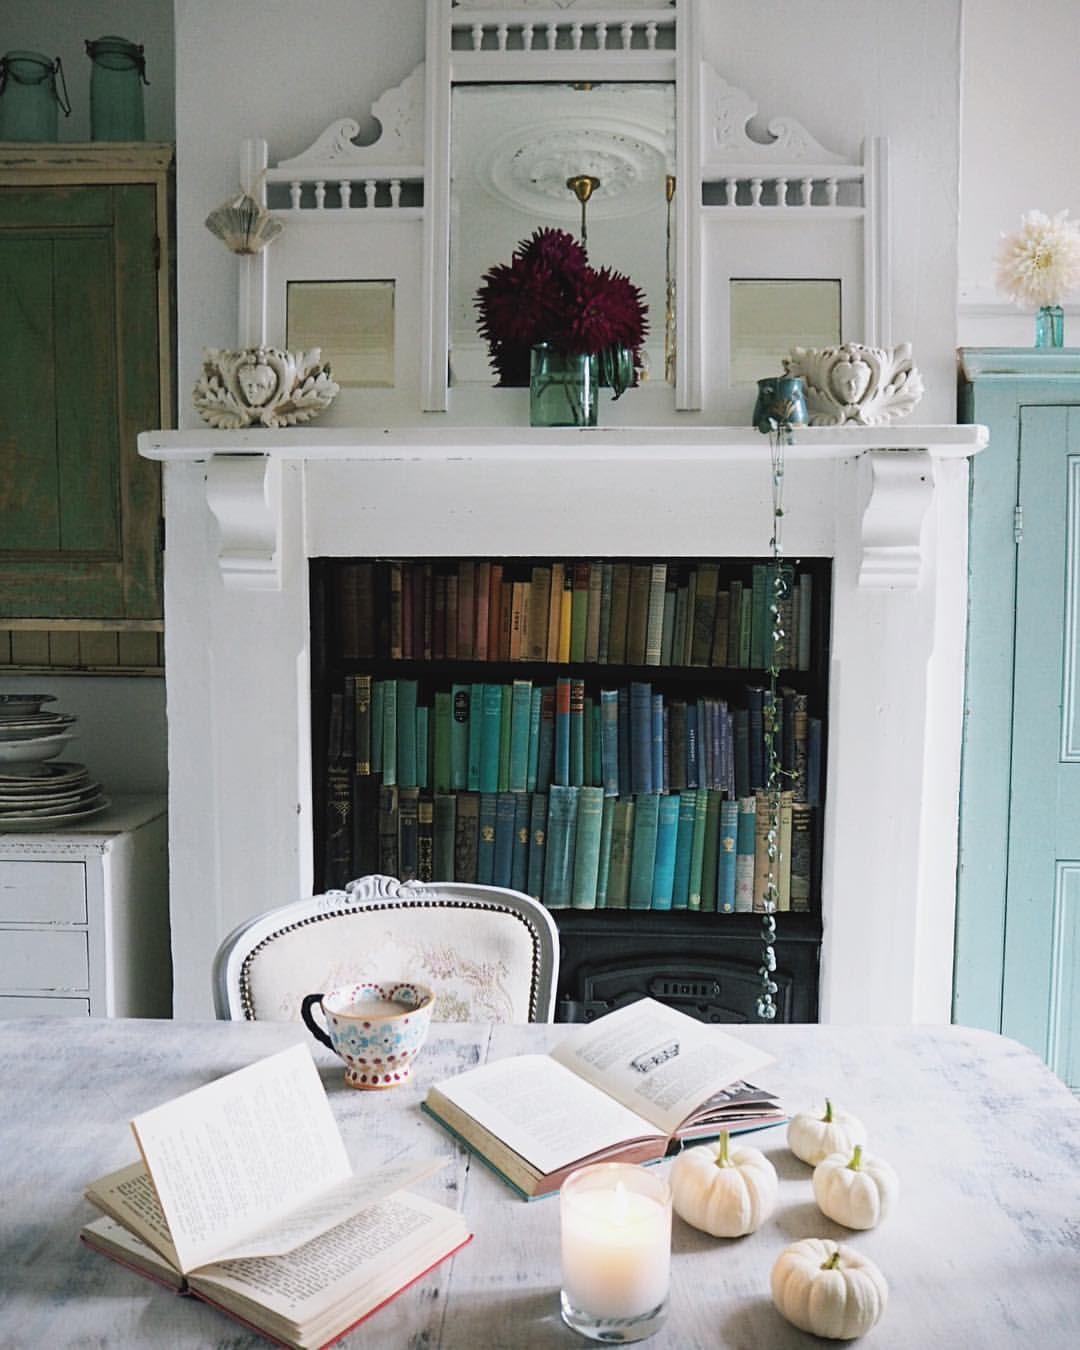 Fireplace book shelf | Decor, Room inspiration, Fireplace